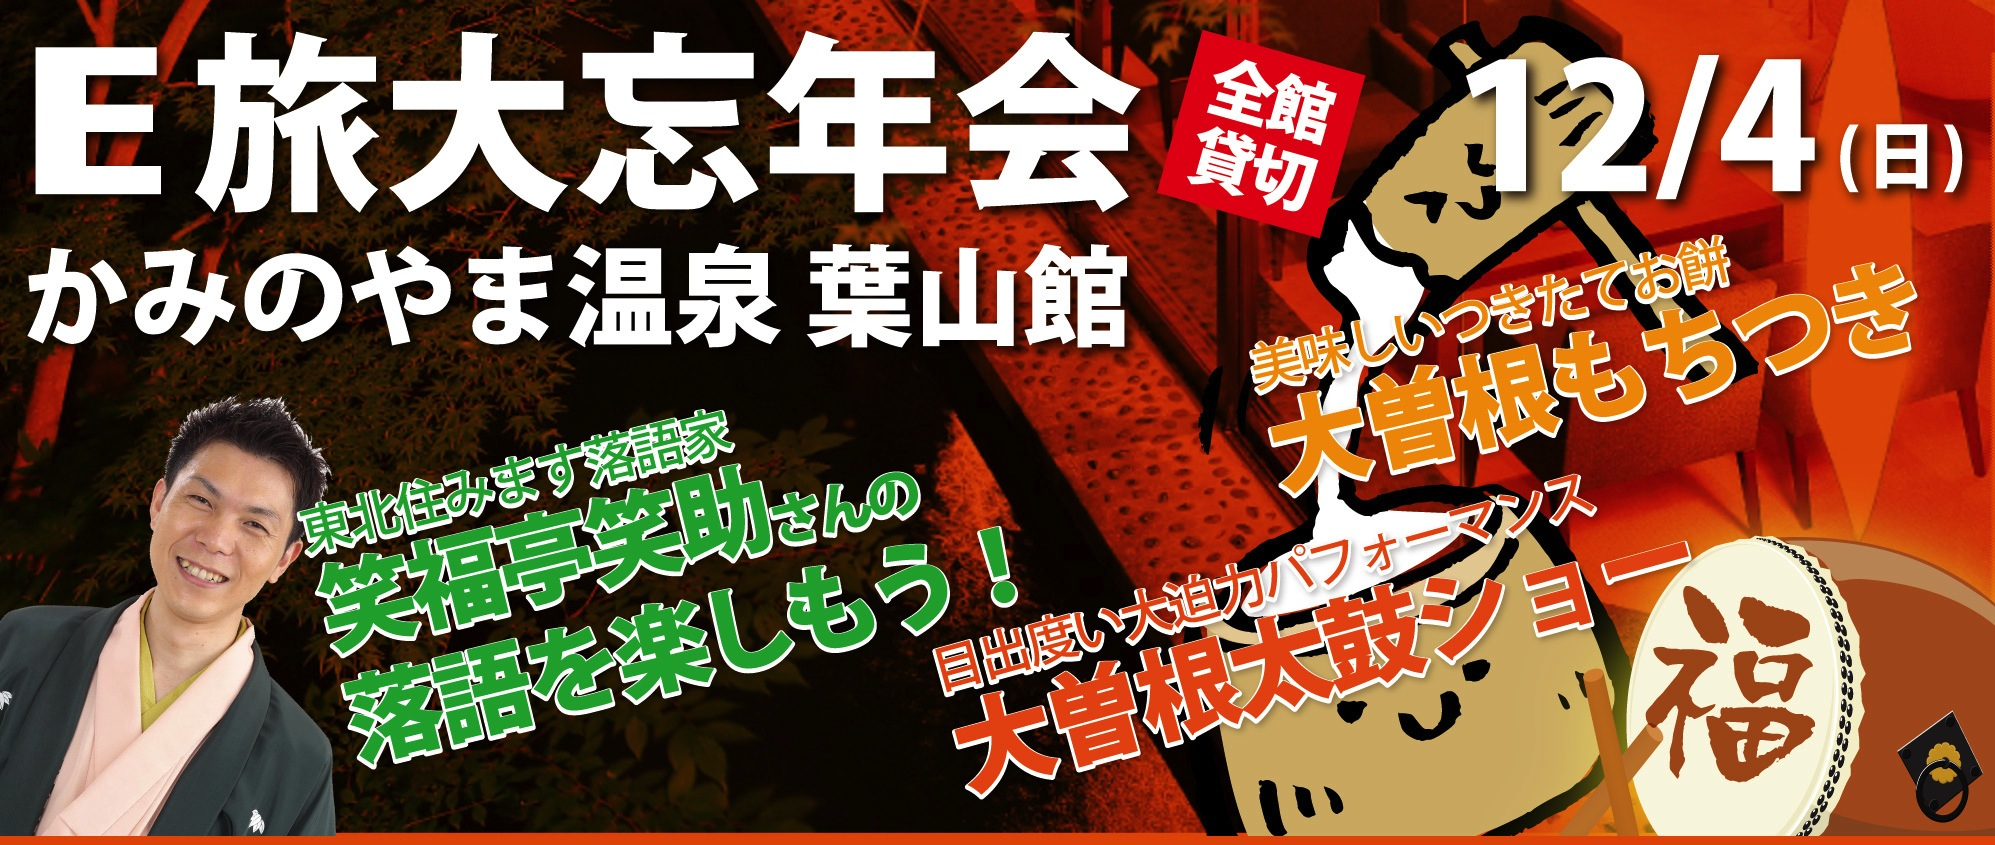 E旅大忘年会 in 葉山館 12/4(日)